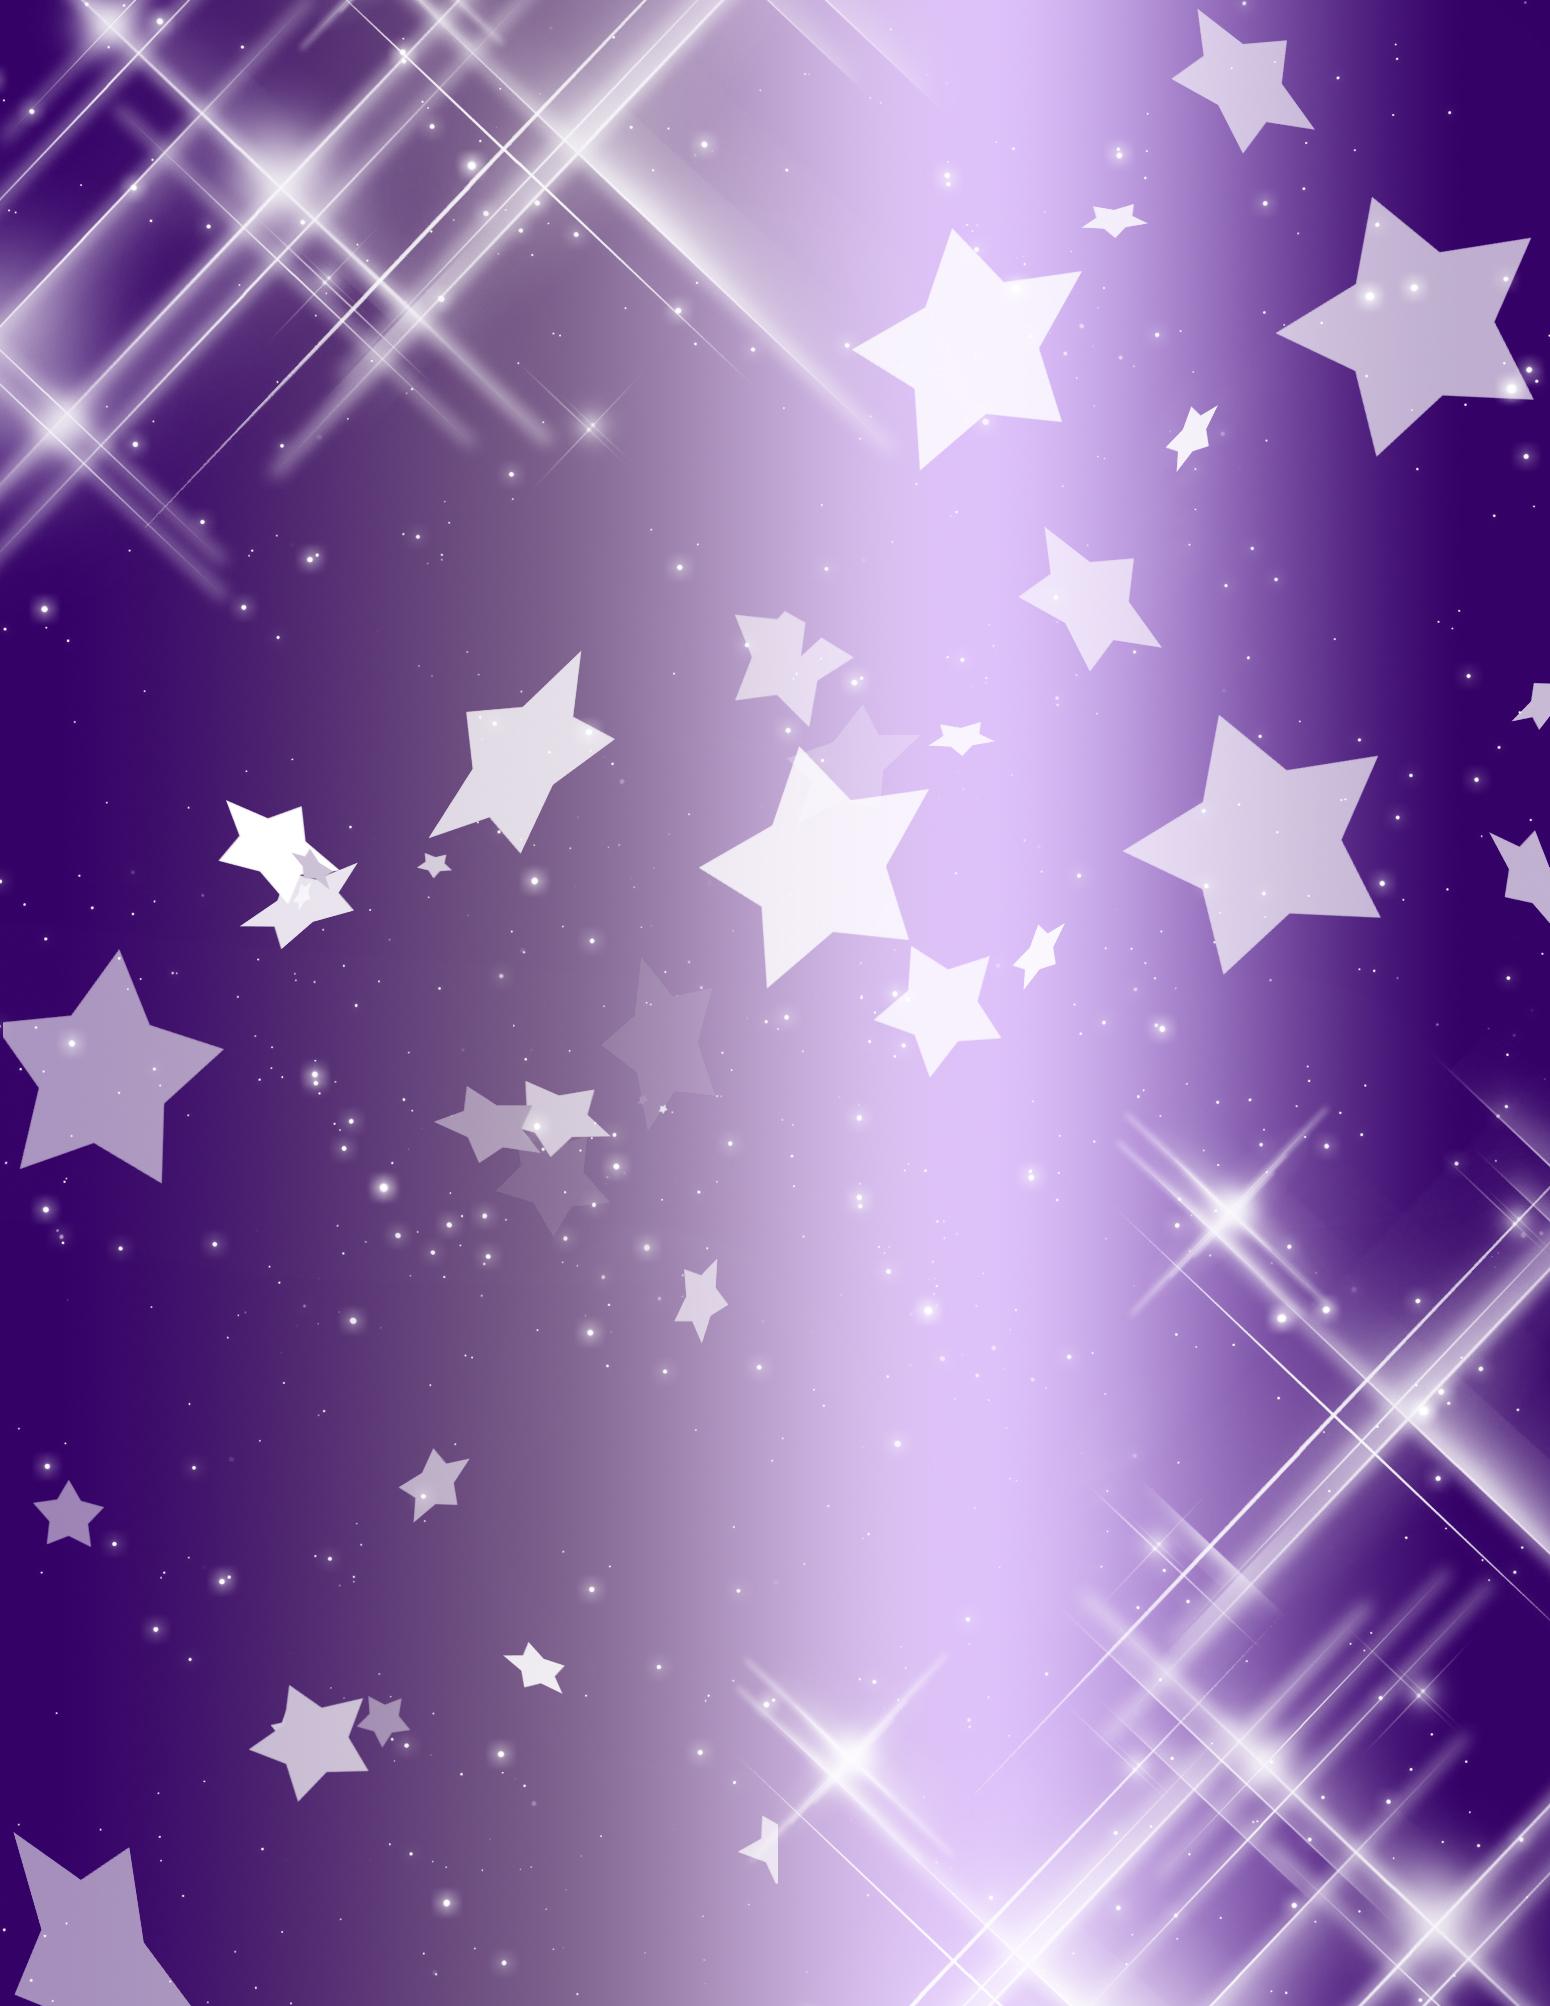 Шаблоны с звездами